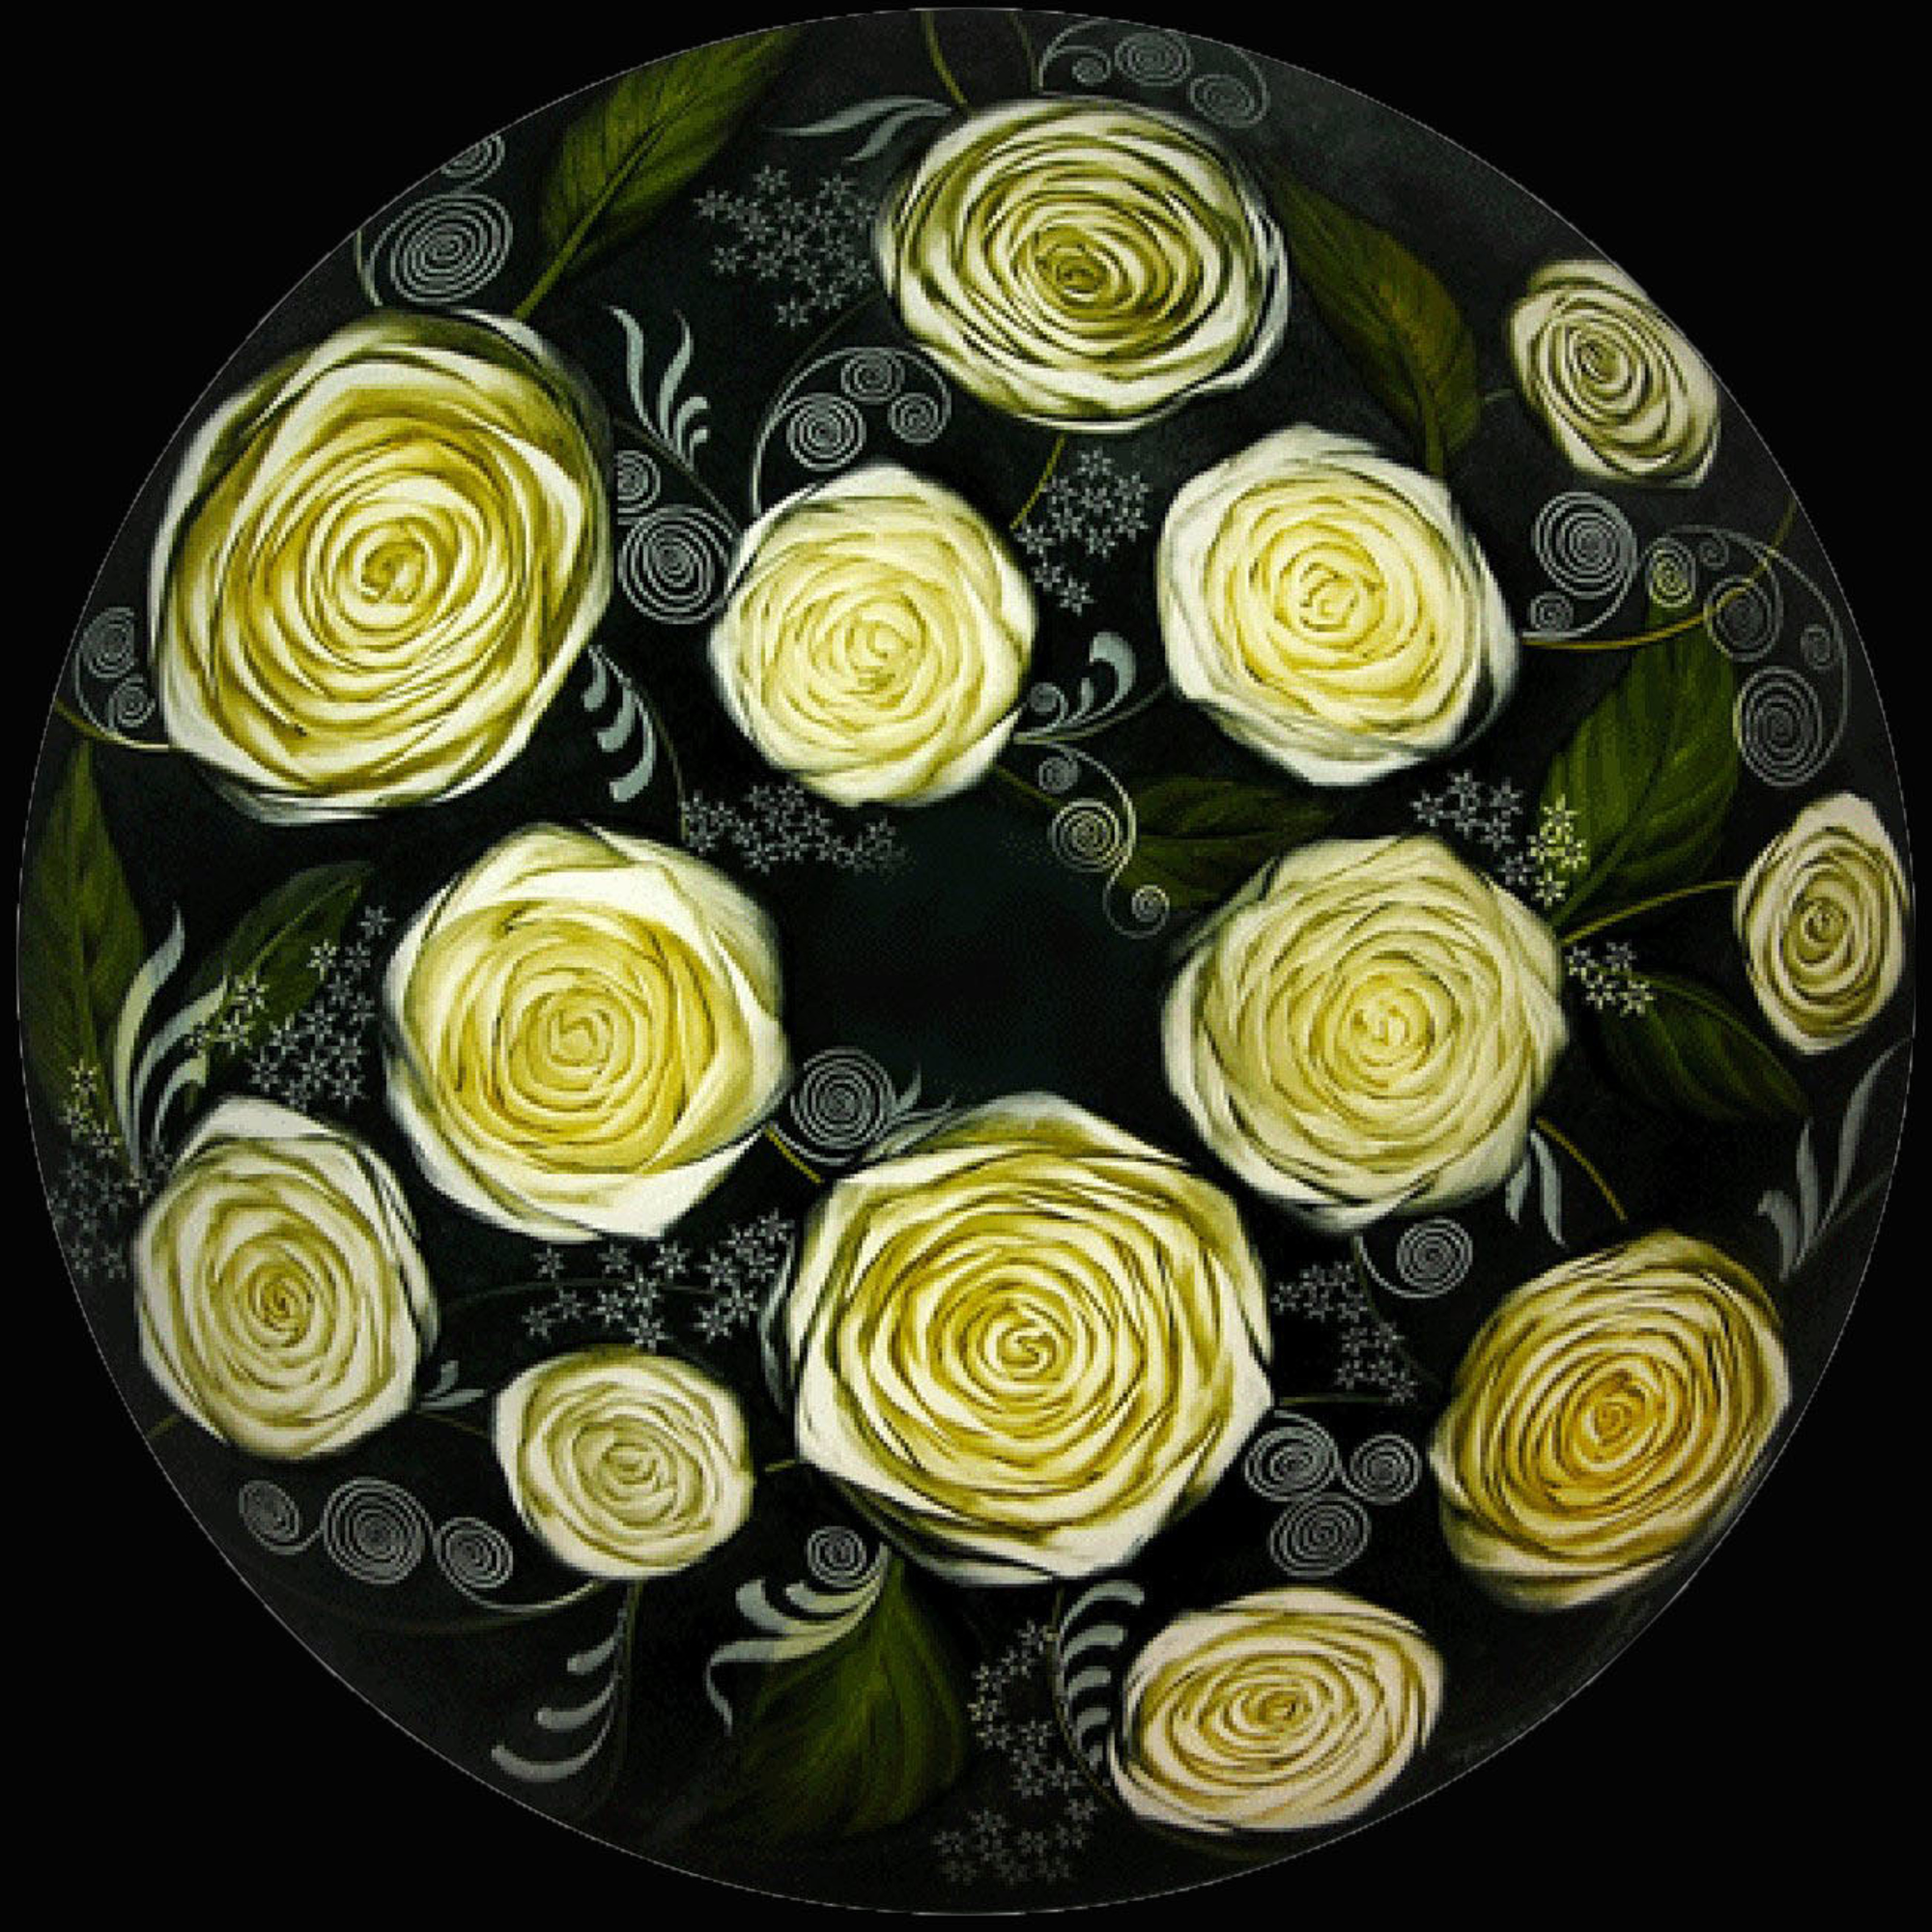 Design White Roses by Jamie Barthel